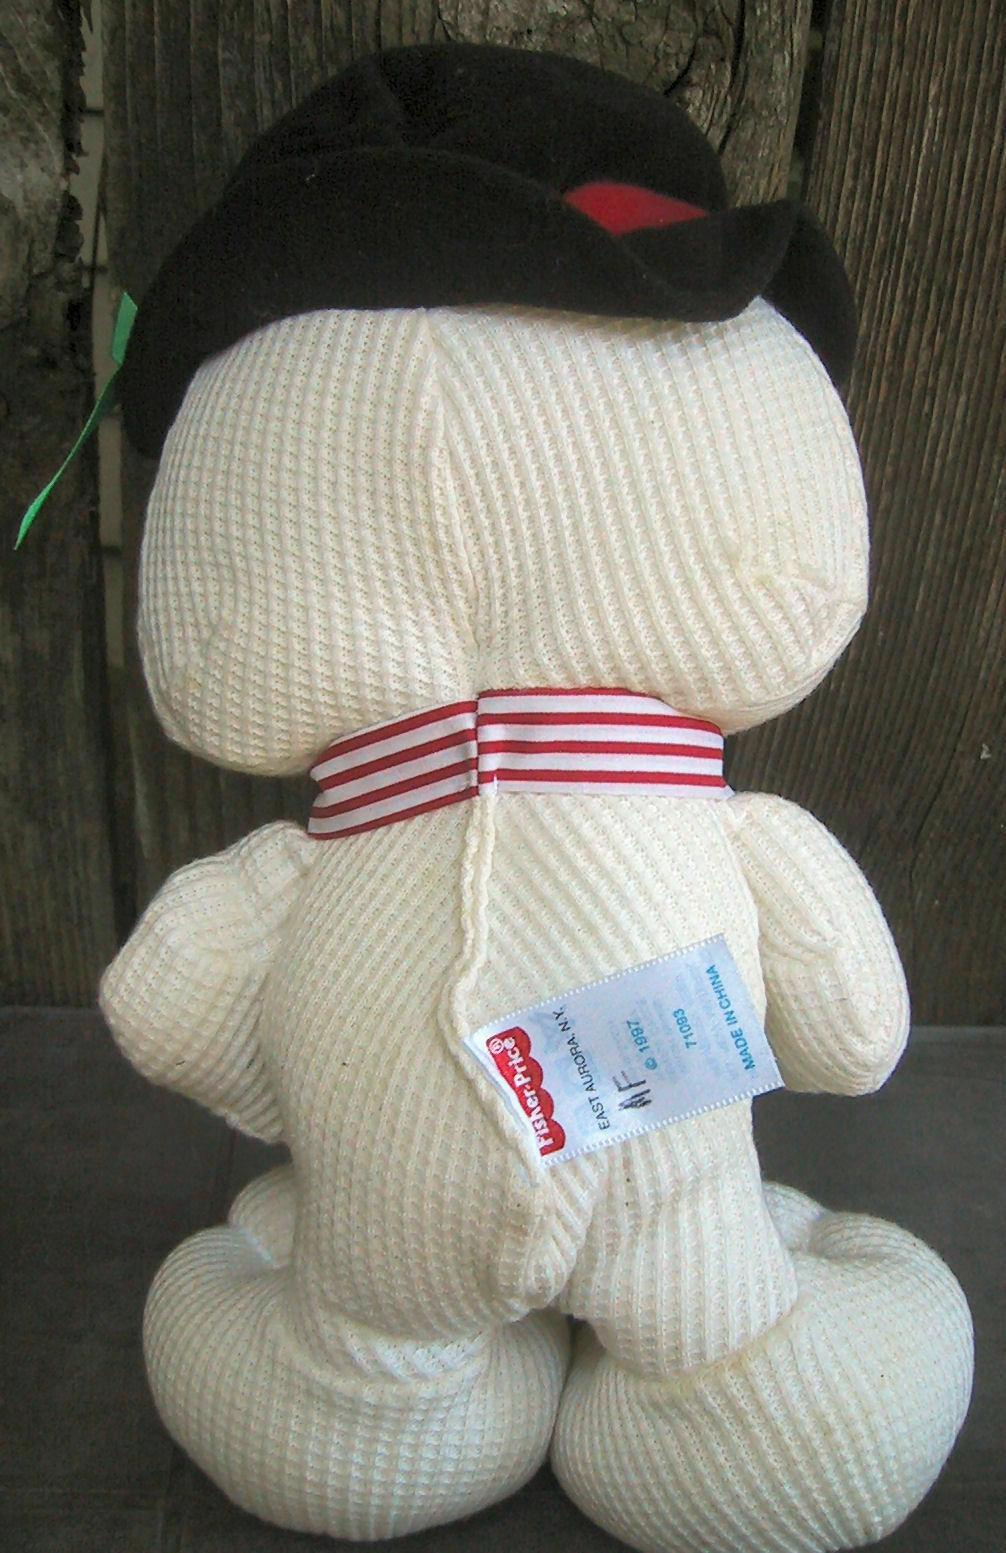 Fisher Price 1997 Cozy Cozie Bear Thermal Snowman Plush Doll 71093 Stuffed